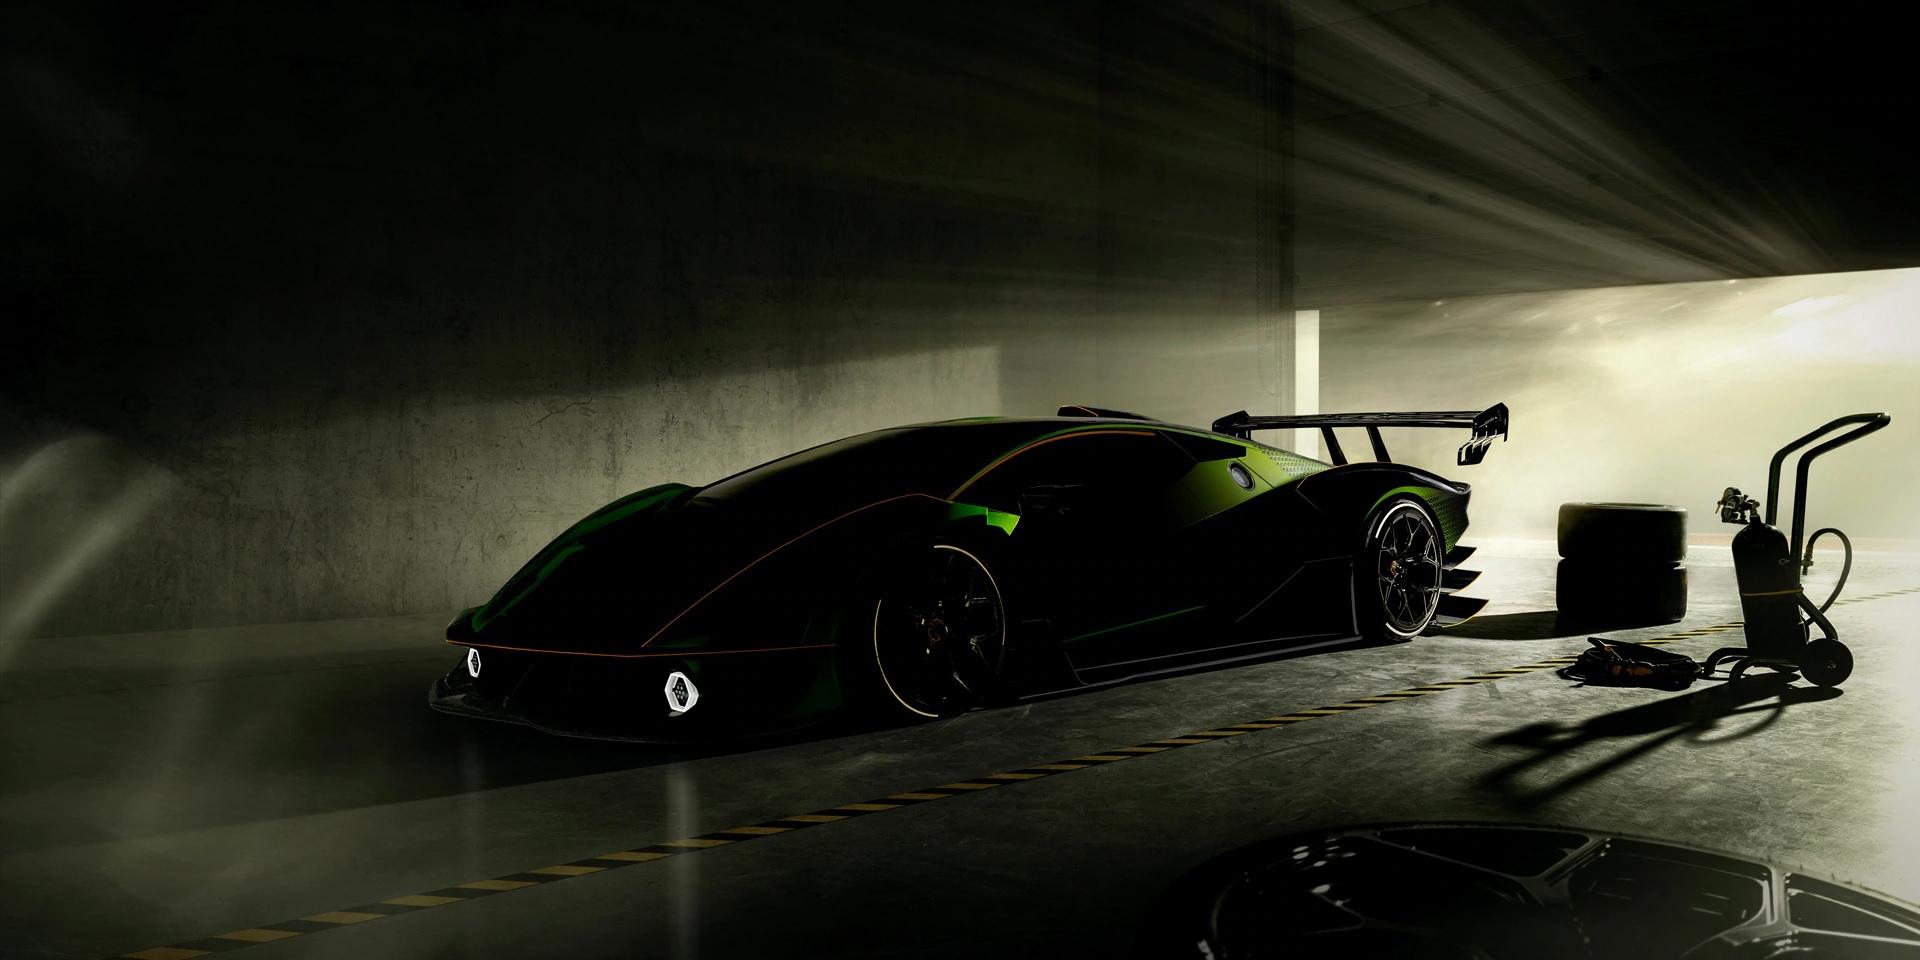 819hp最大馬力!Lamborghini SCV12即將出閘!